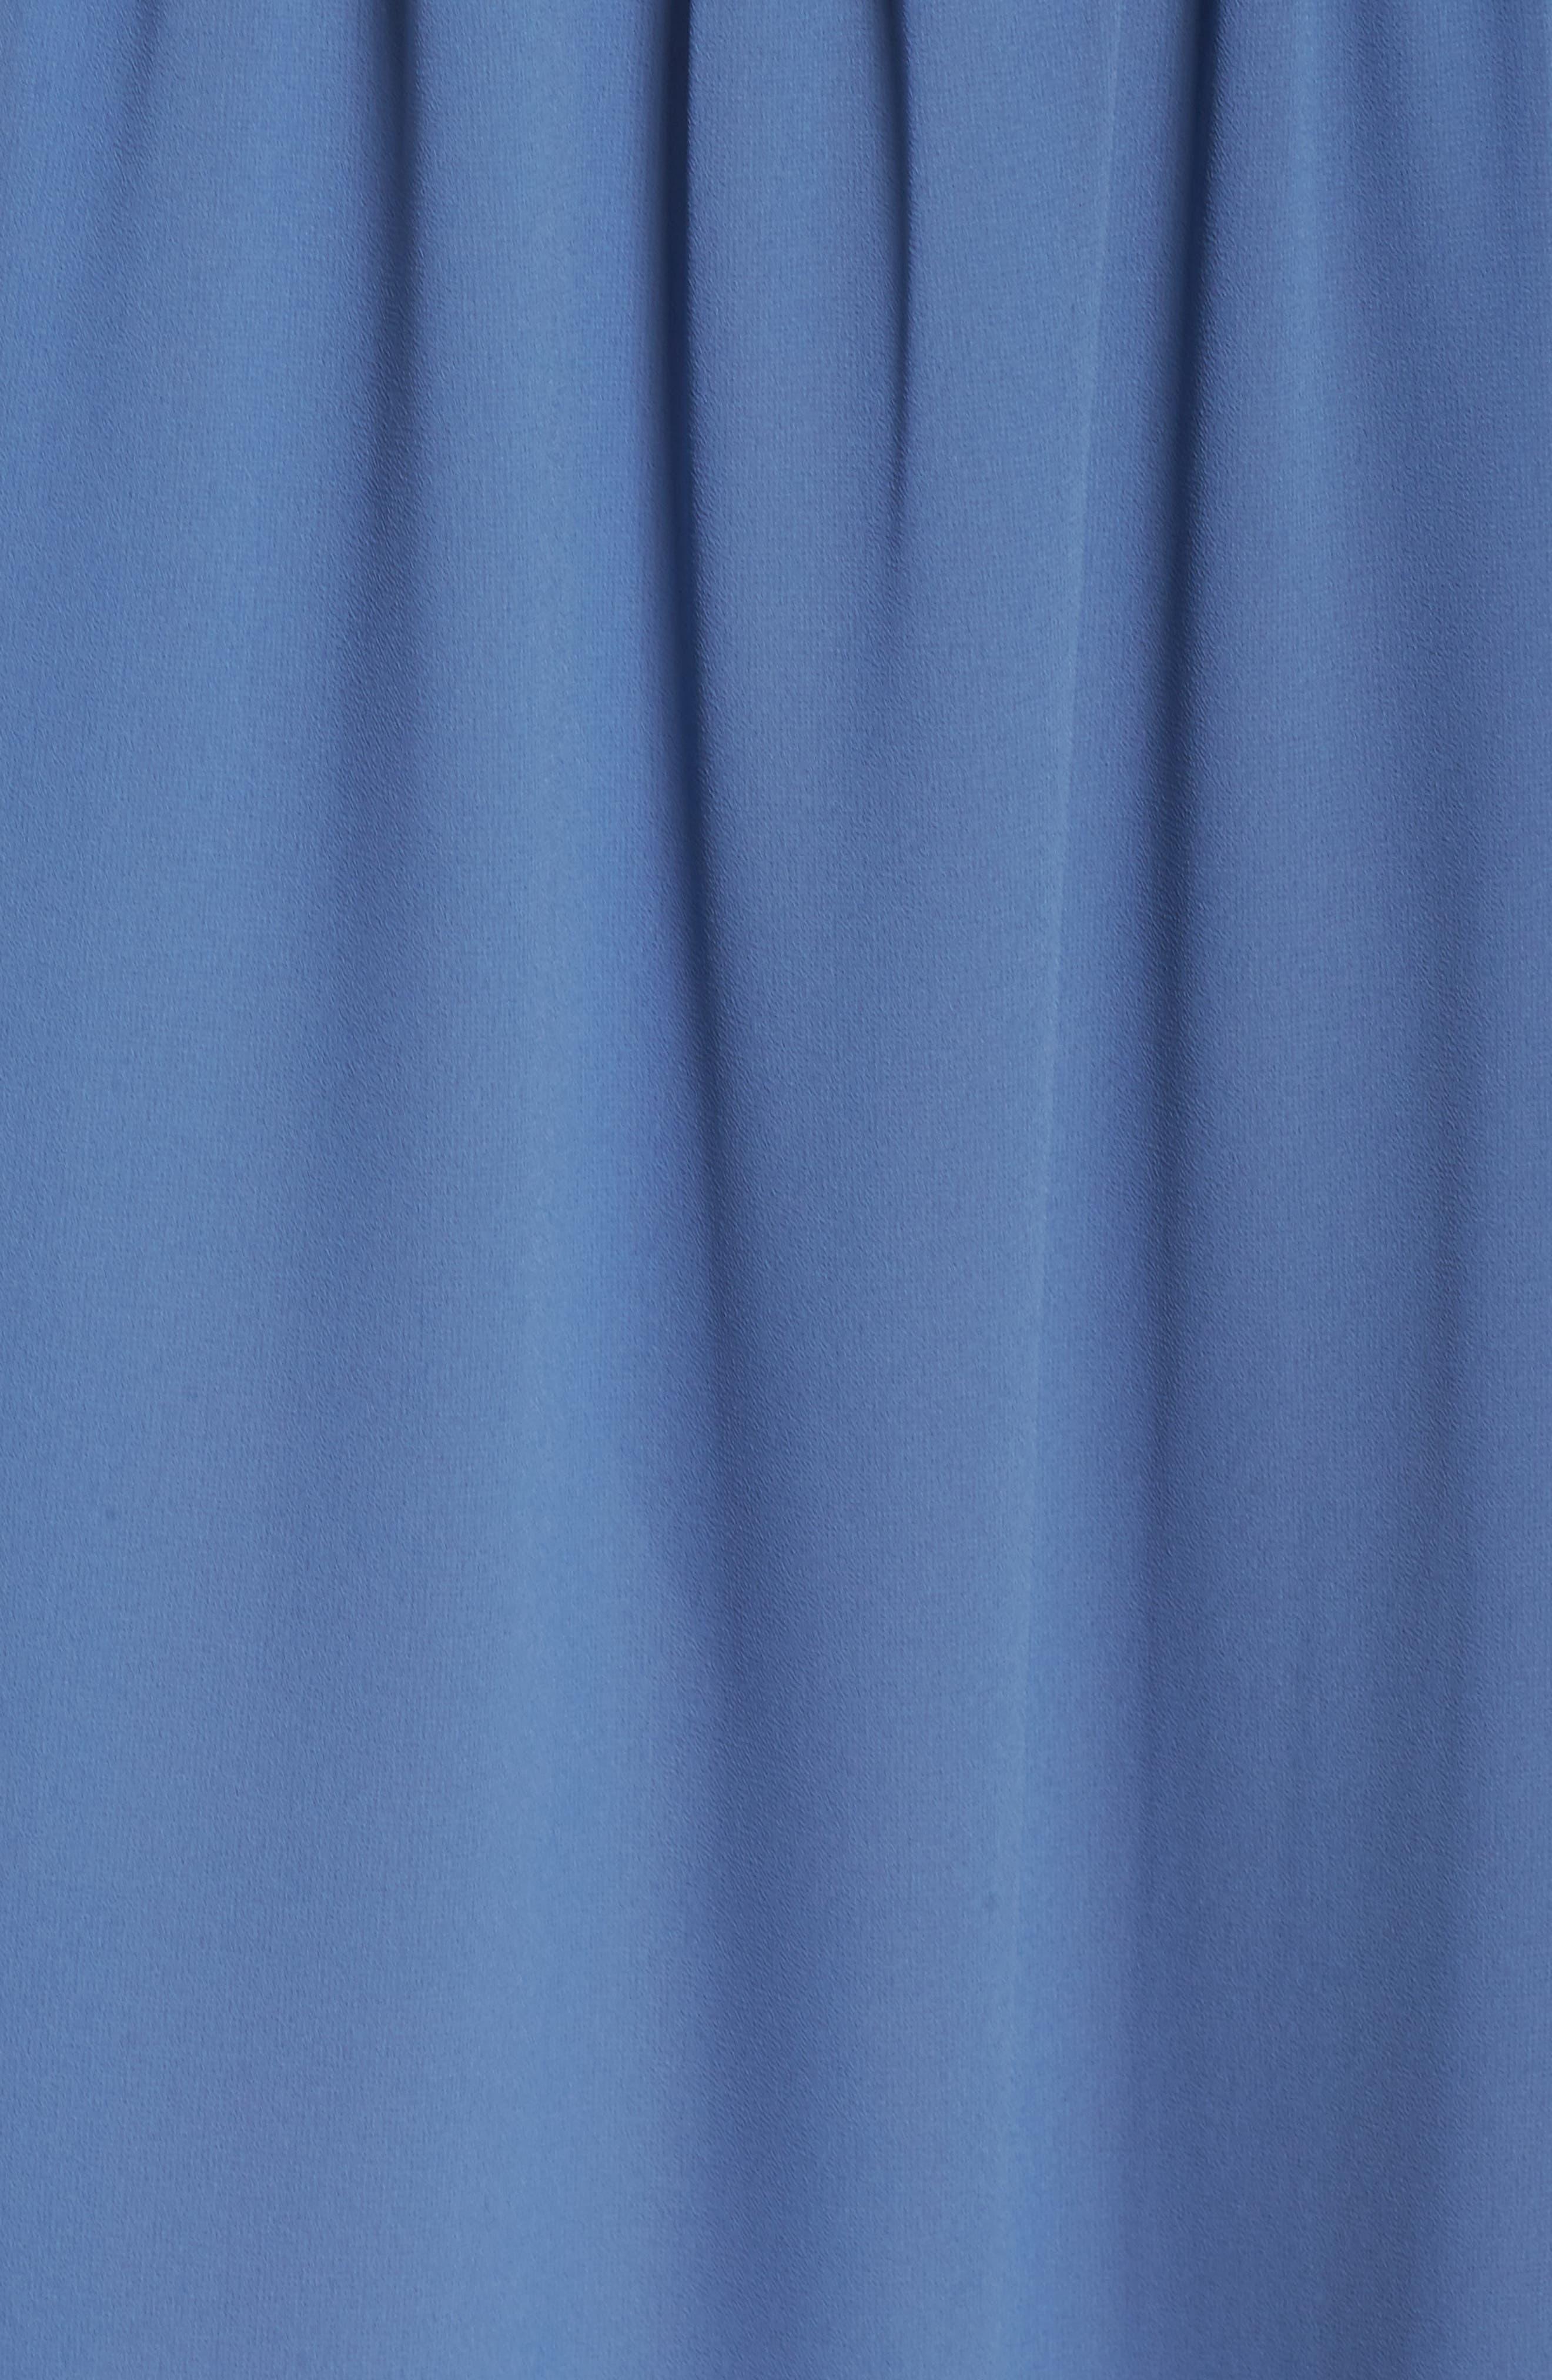 Smocked Chiffon Dress,                             Alternate thumbnail 5, color,                             400